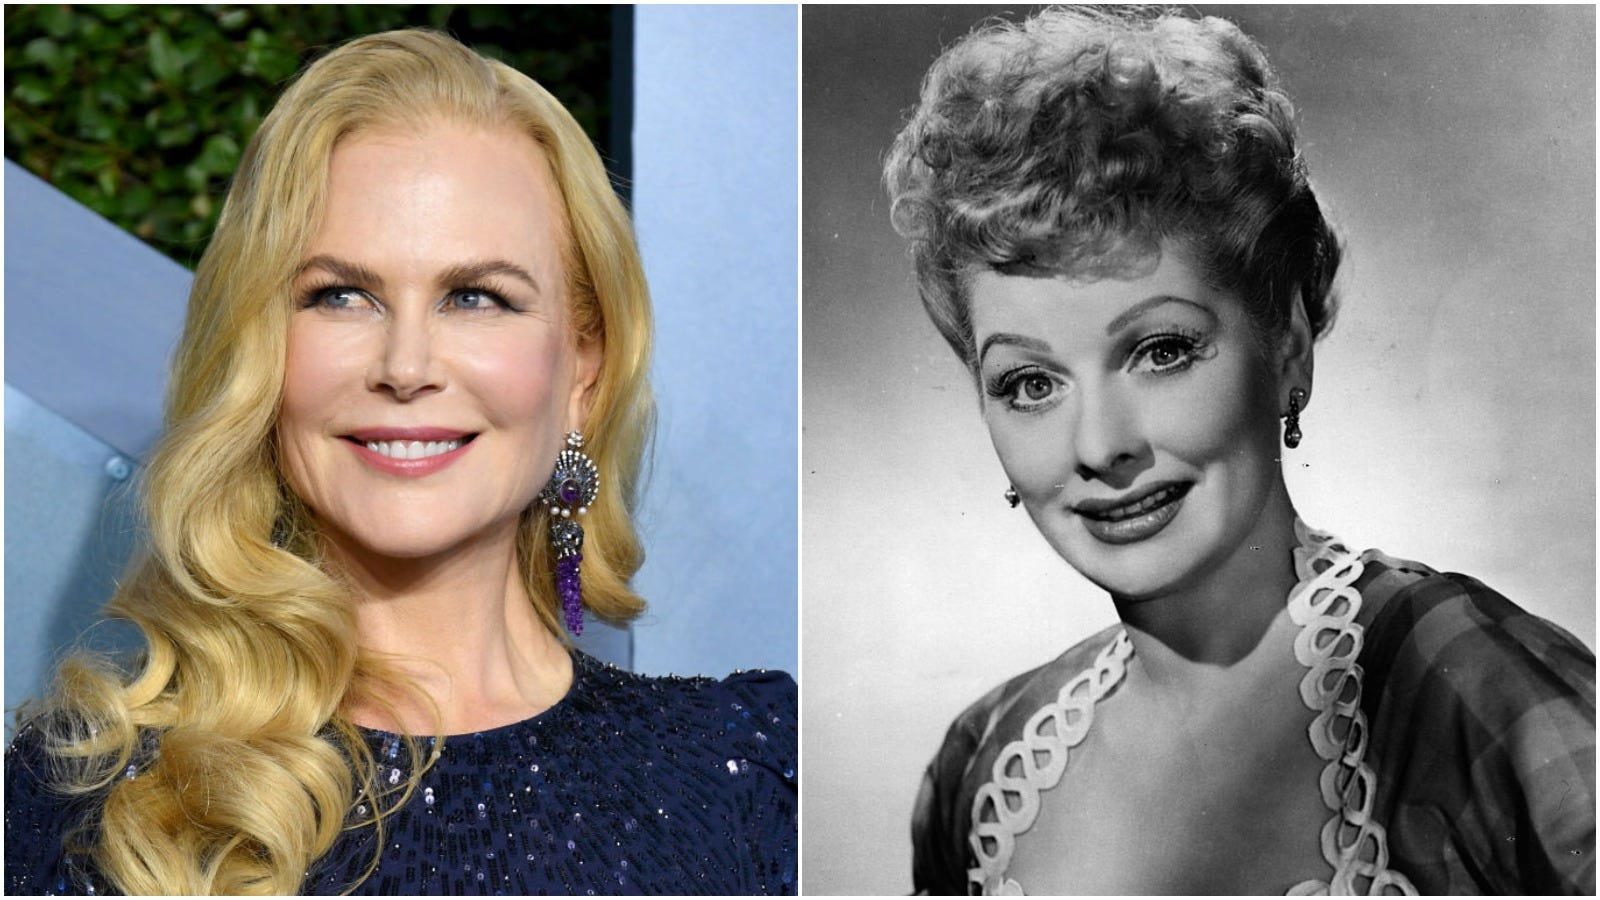 Nicole Kidman transforms into Lucille Ball on new film set